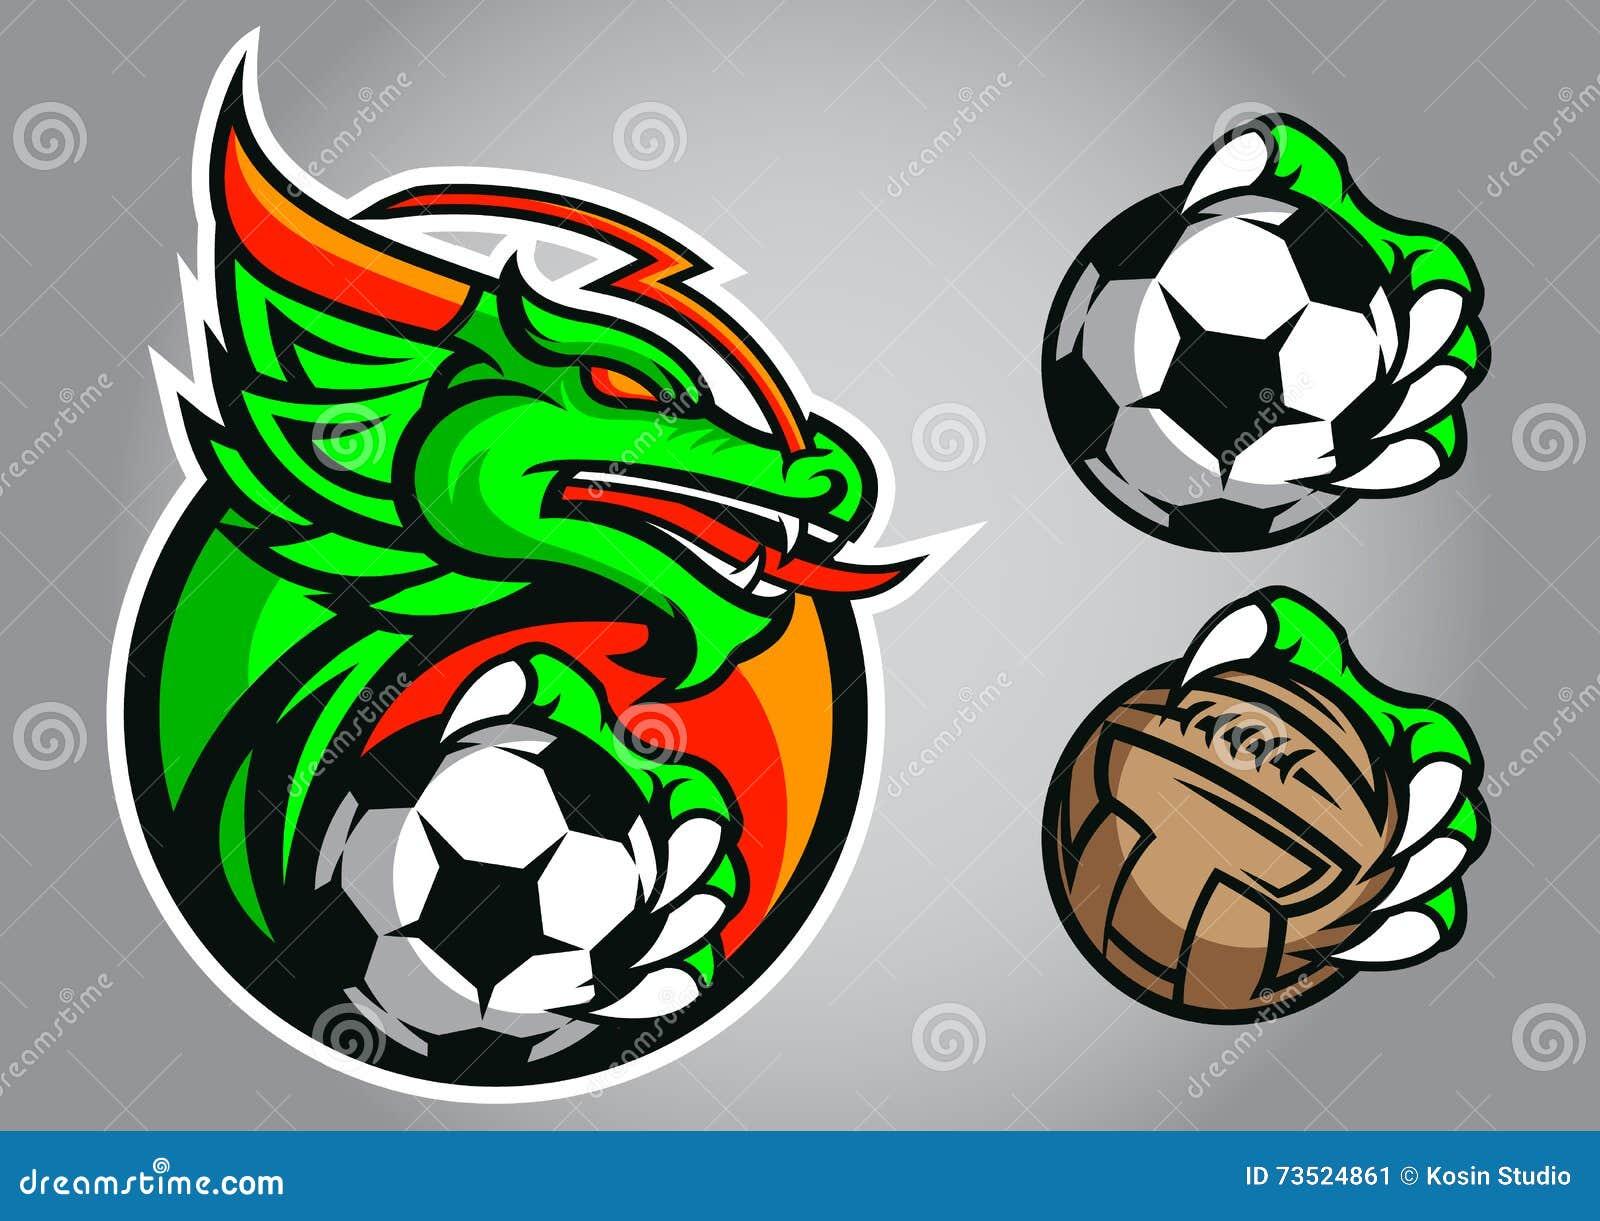 dragon football logo vector emblem stock vector image